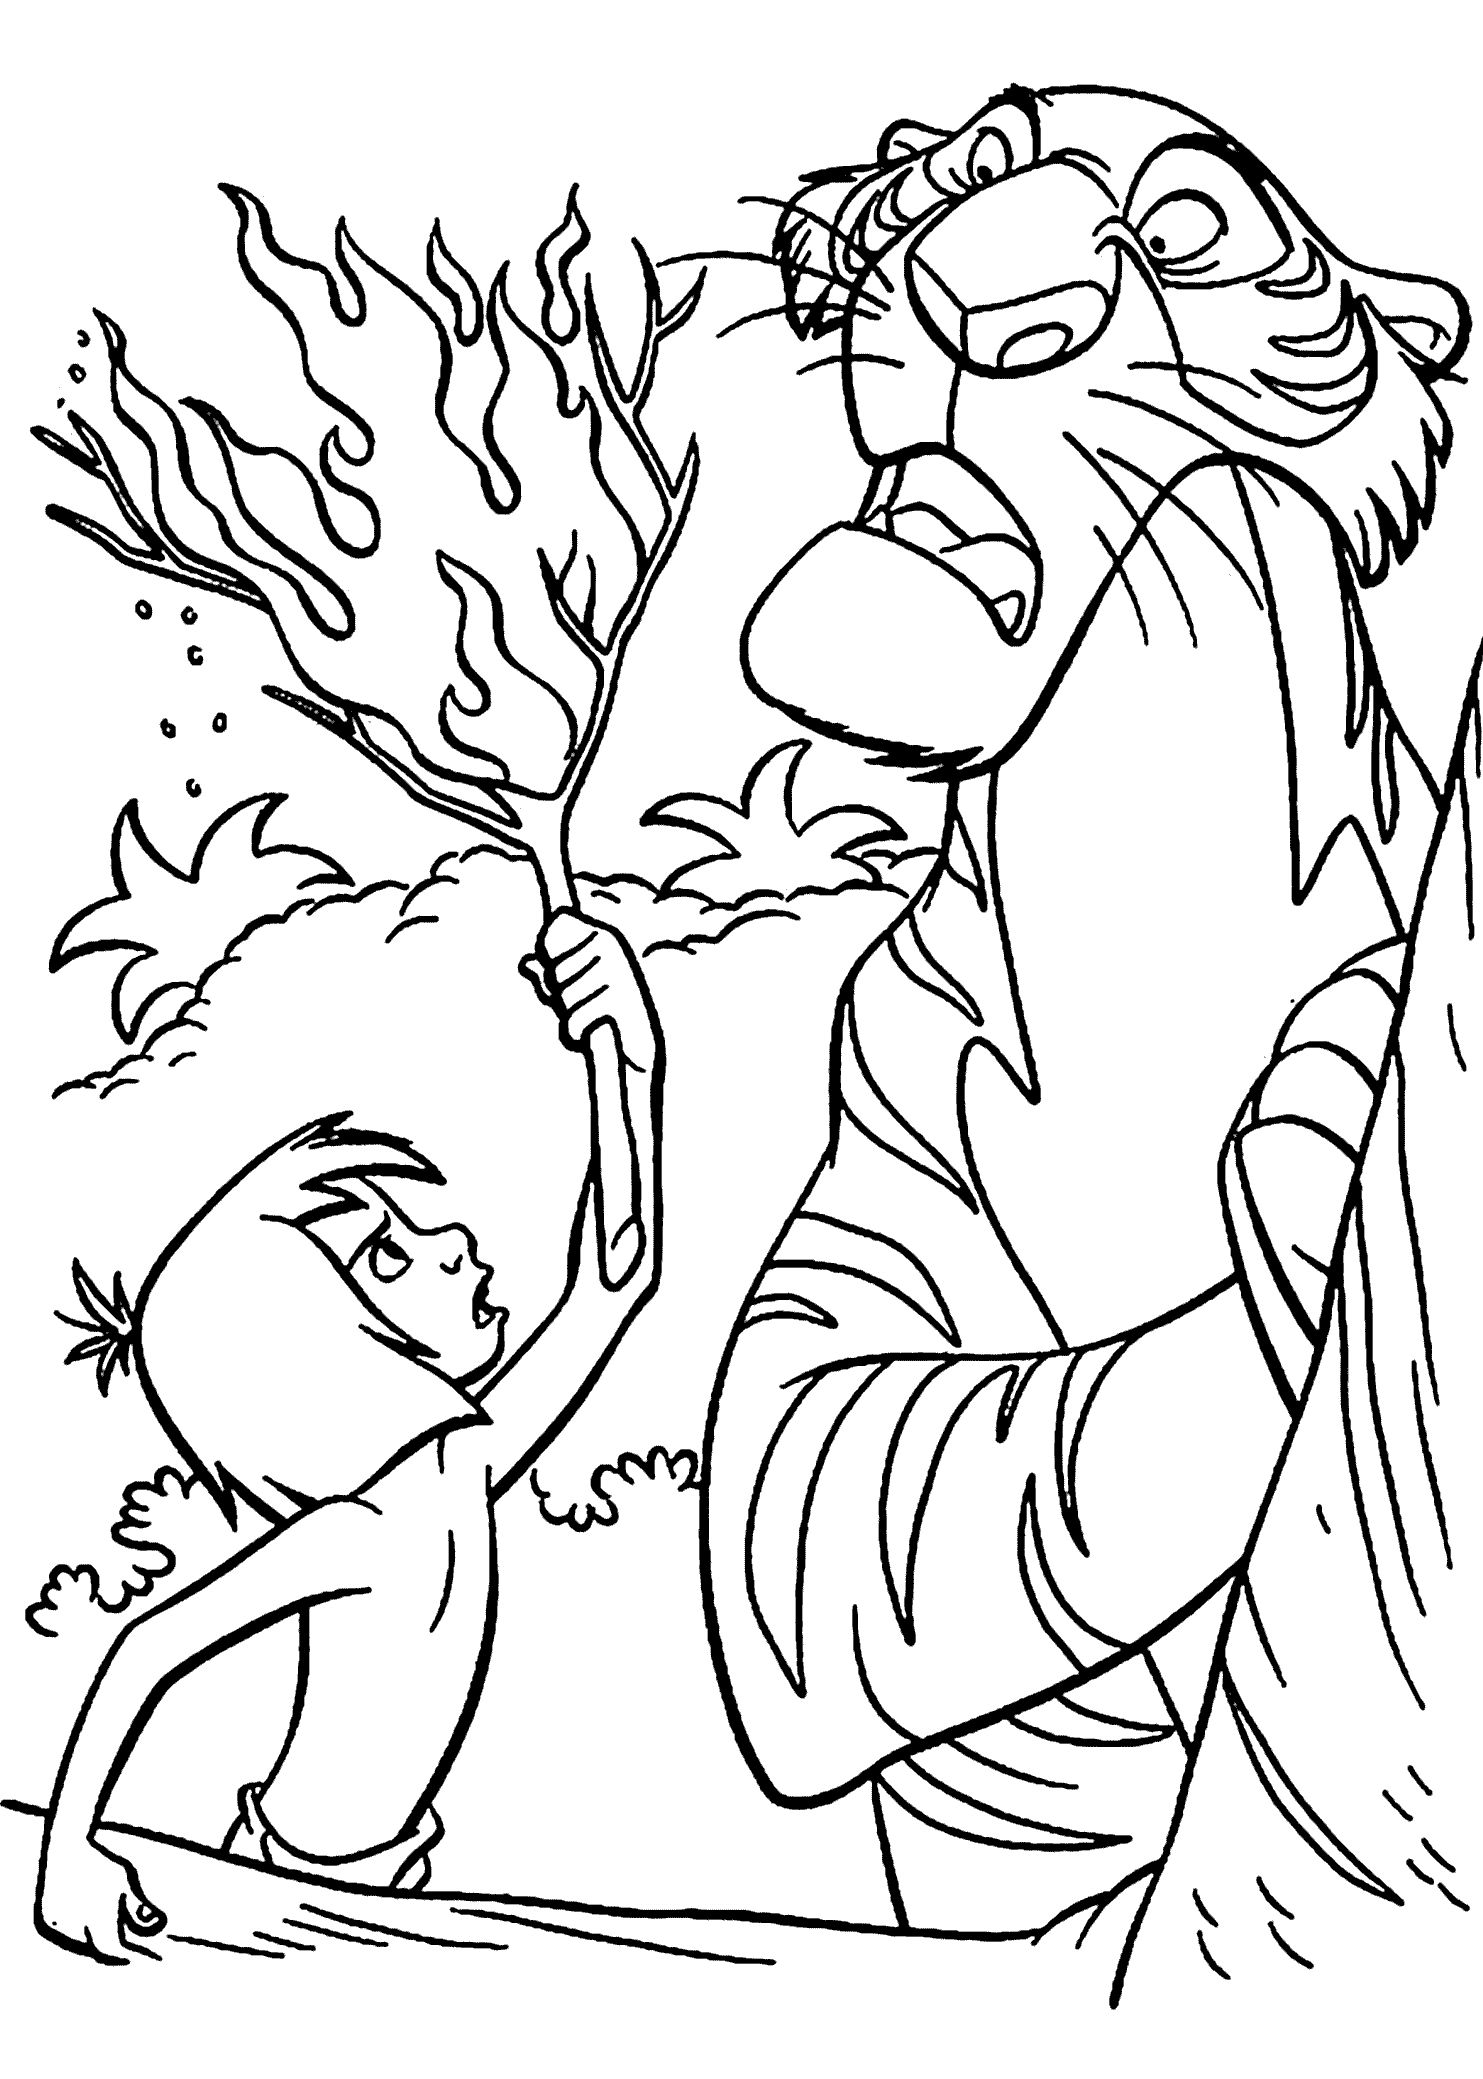 1483x2079 Mowgli And Shir Khan Coloring Page Disney's Jungle Book School